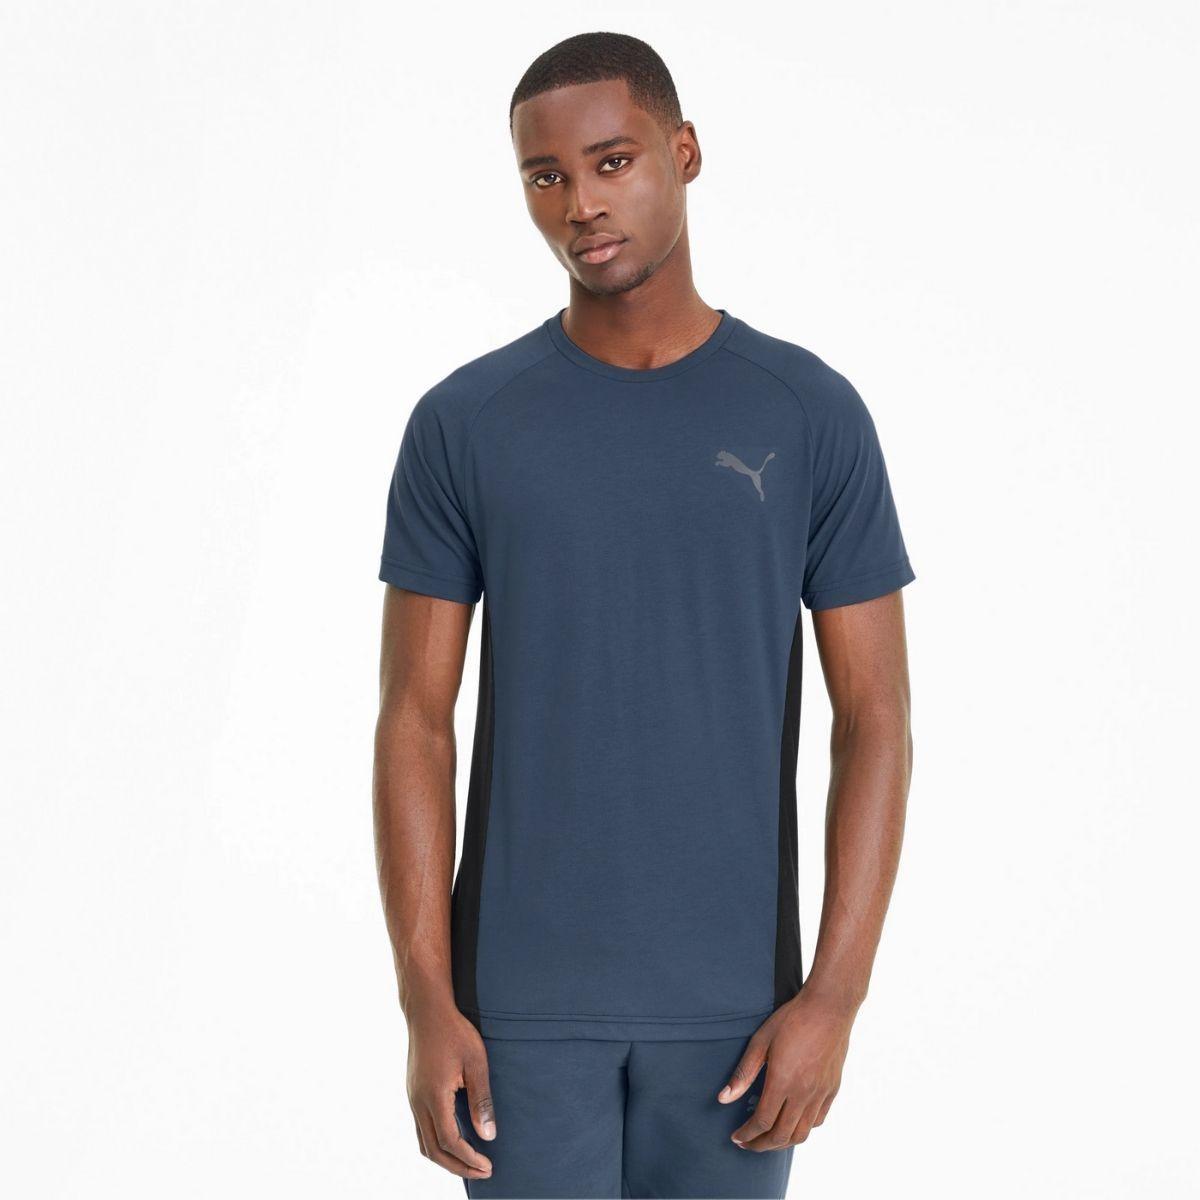 T-Shirt Puma Evostripe Uomo...